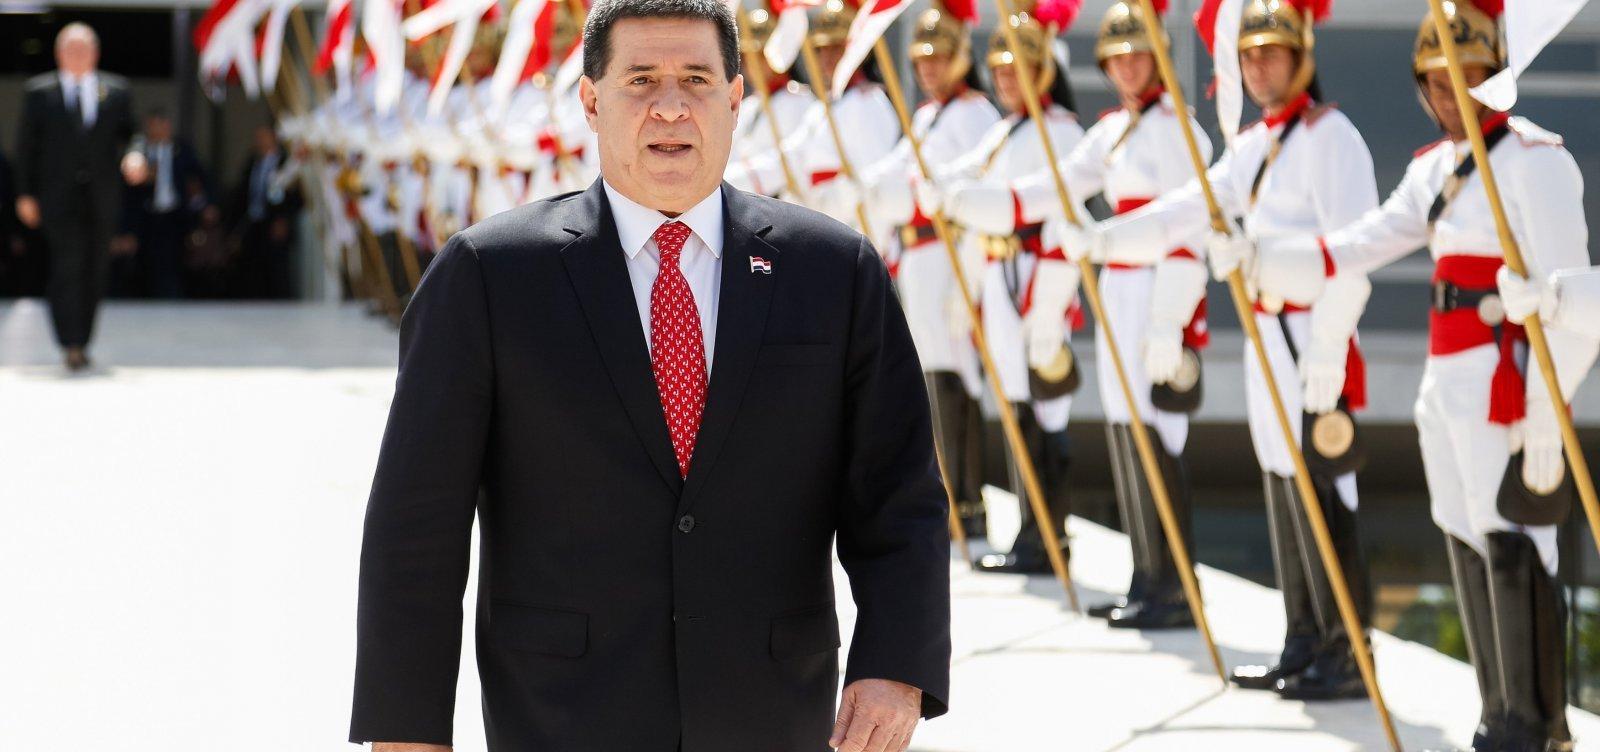 TRF-2 nega pedido de liberdadeaoex-presidente do Paraguai Horacio Cartes